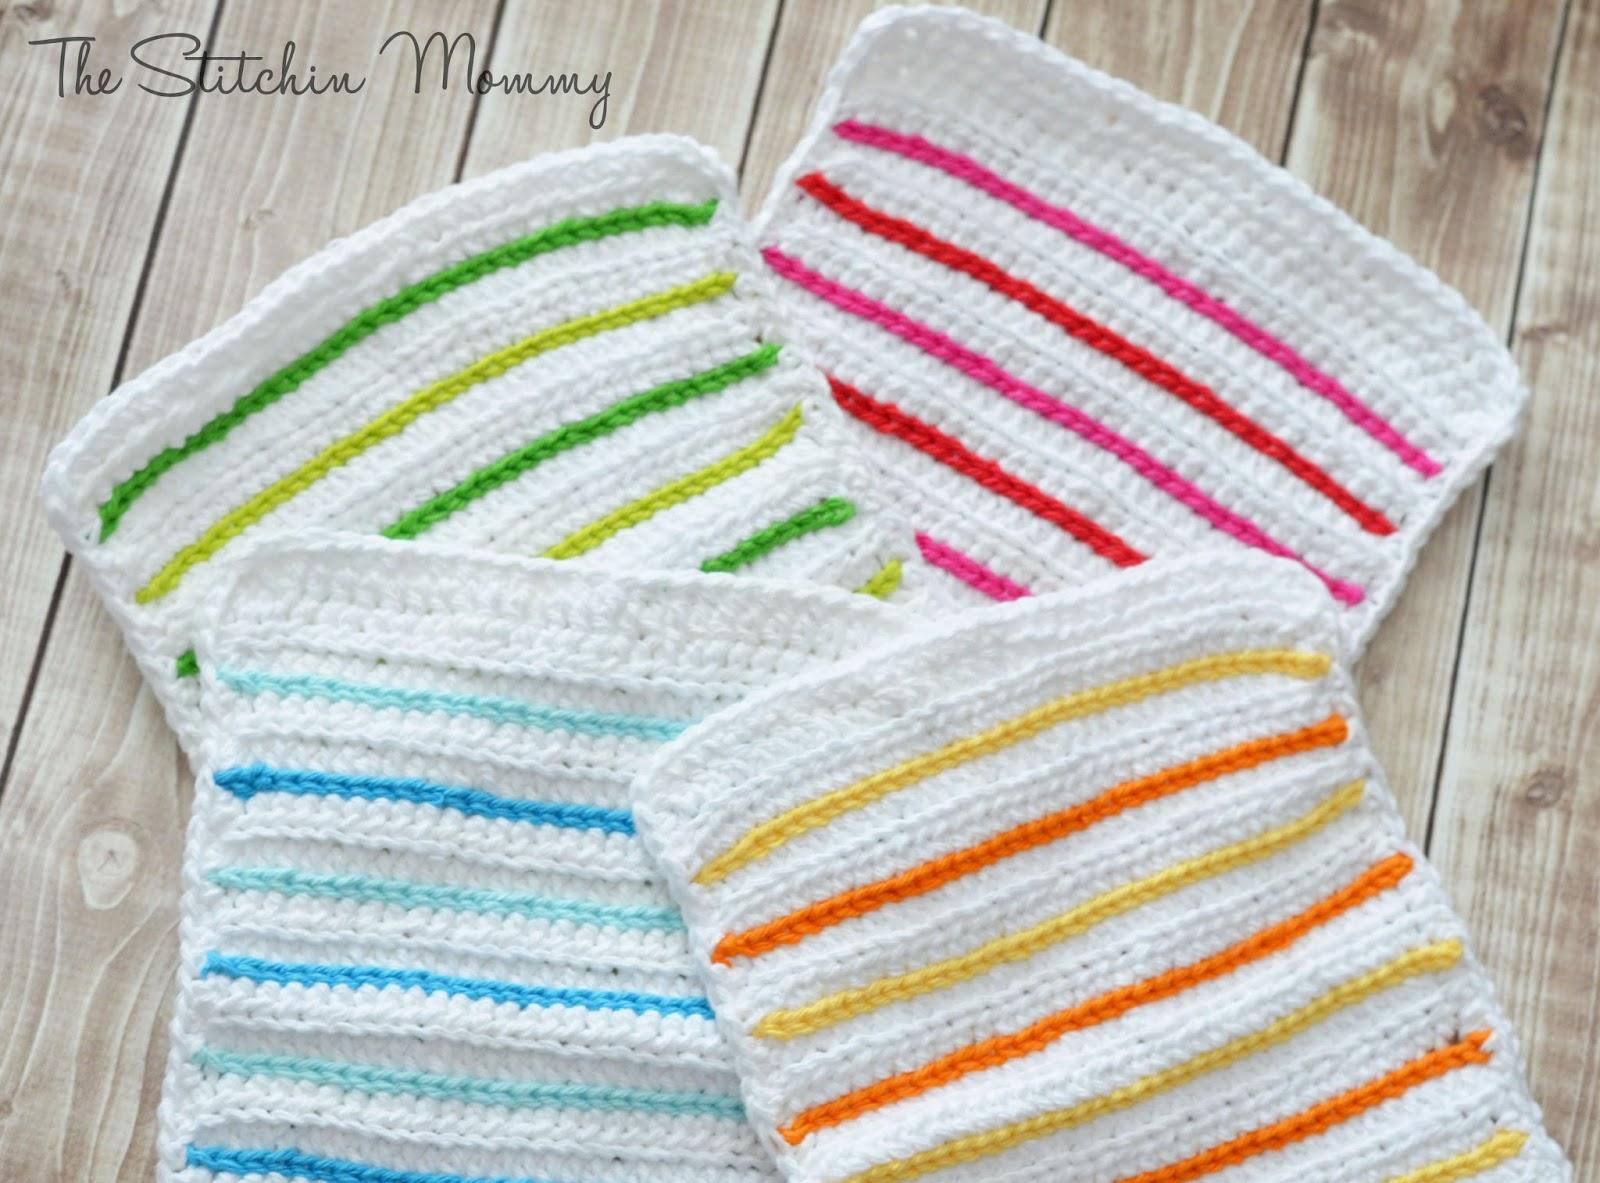 35c7fc2be Fiber Flux  Super Stripes! 30+ Free Crochet Patterns Full of Stripy ...